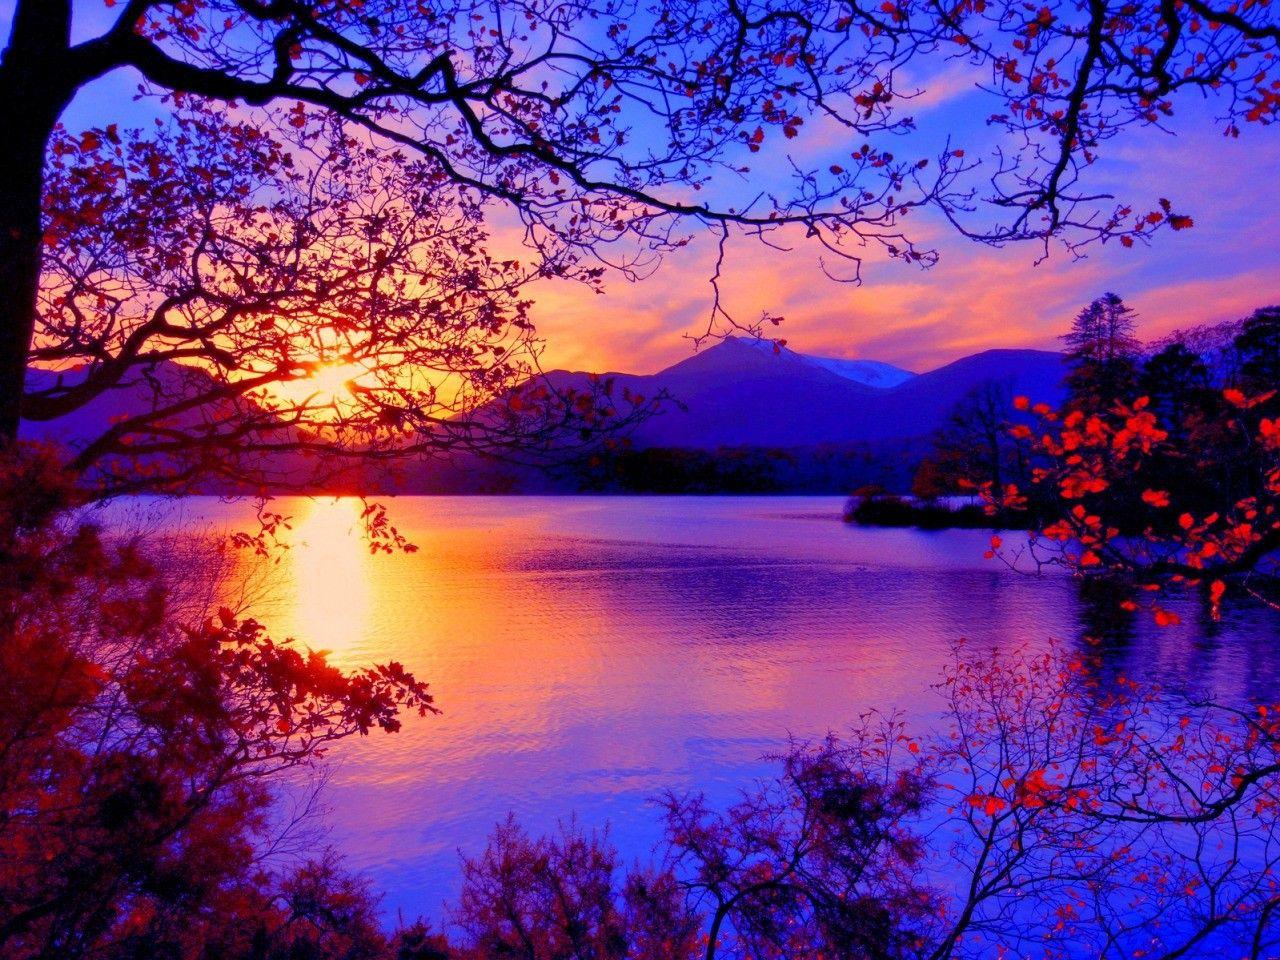 Autumn Background Landscape Landscapes Seasons Quoteko Com Autumn Landscape Scenery Background Beautiful Sunrise